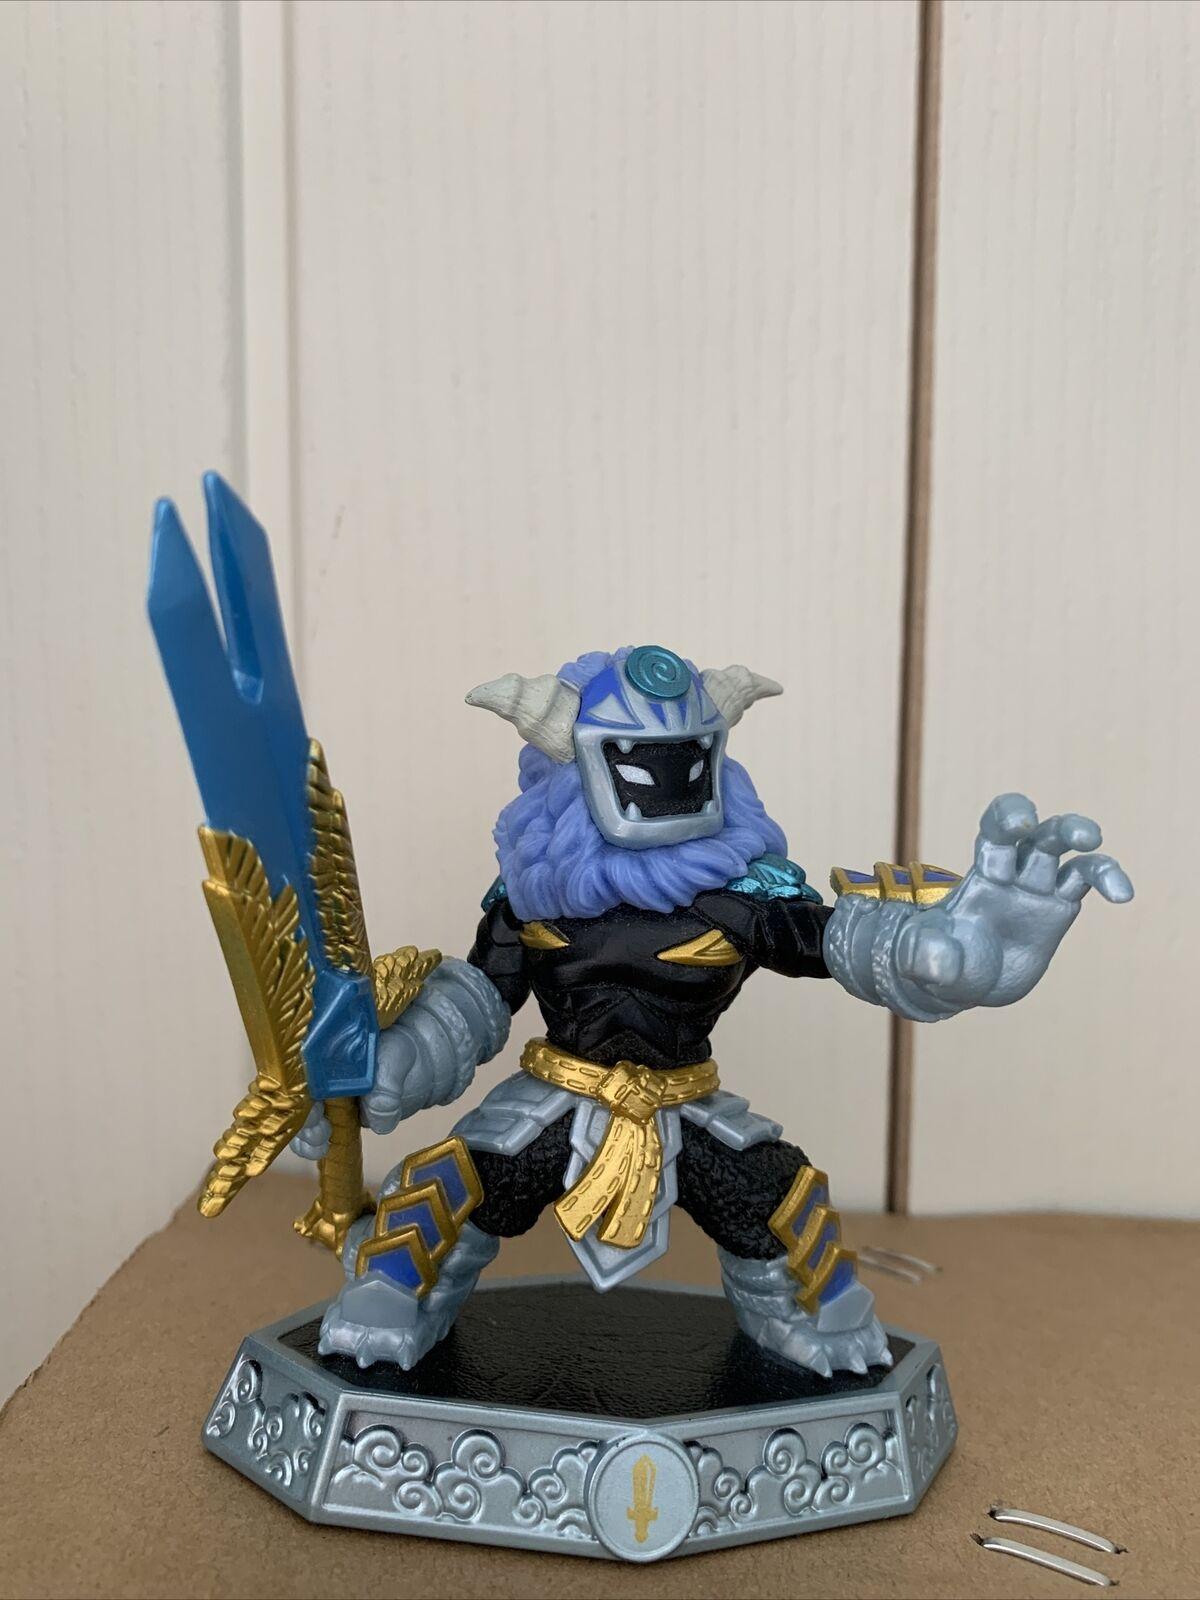 Skylanders Imaginators Wild Storm - Extremely Rare